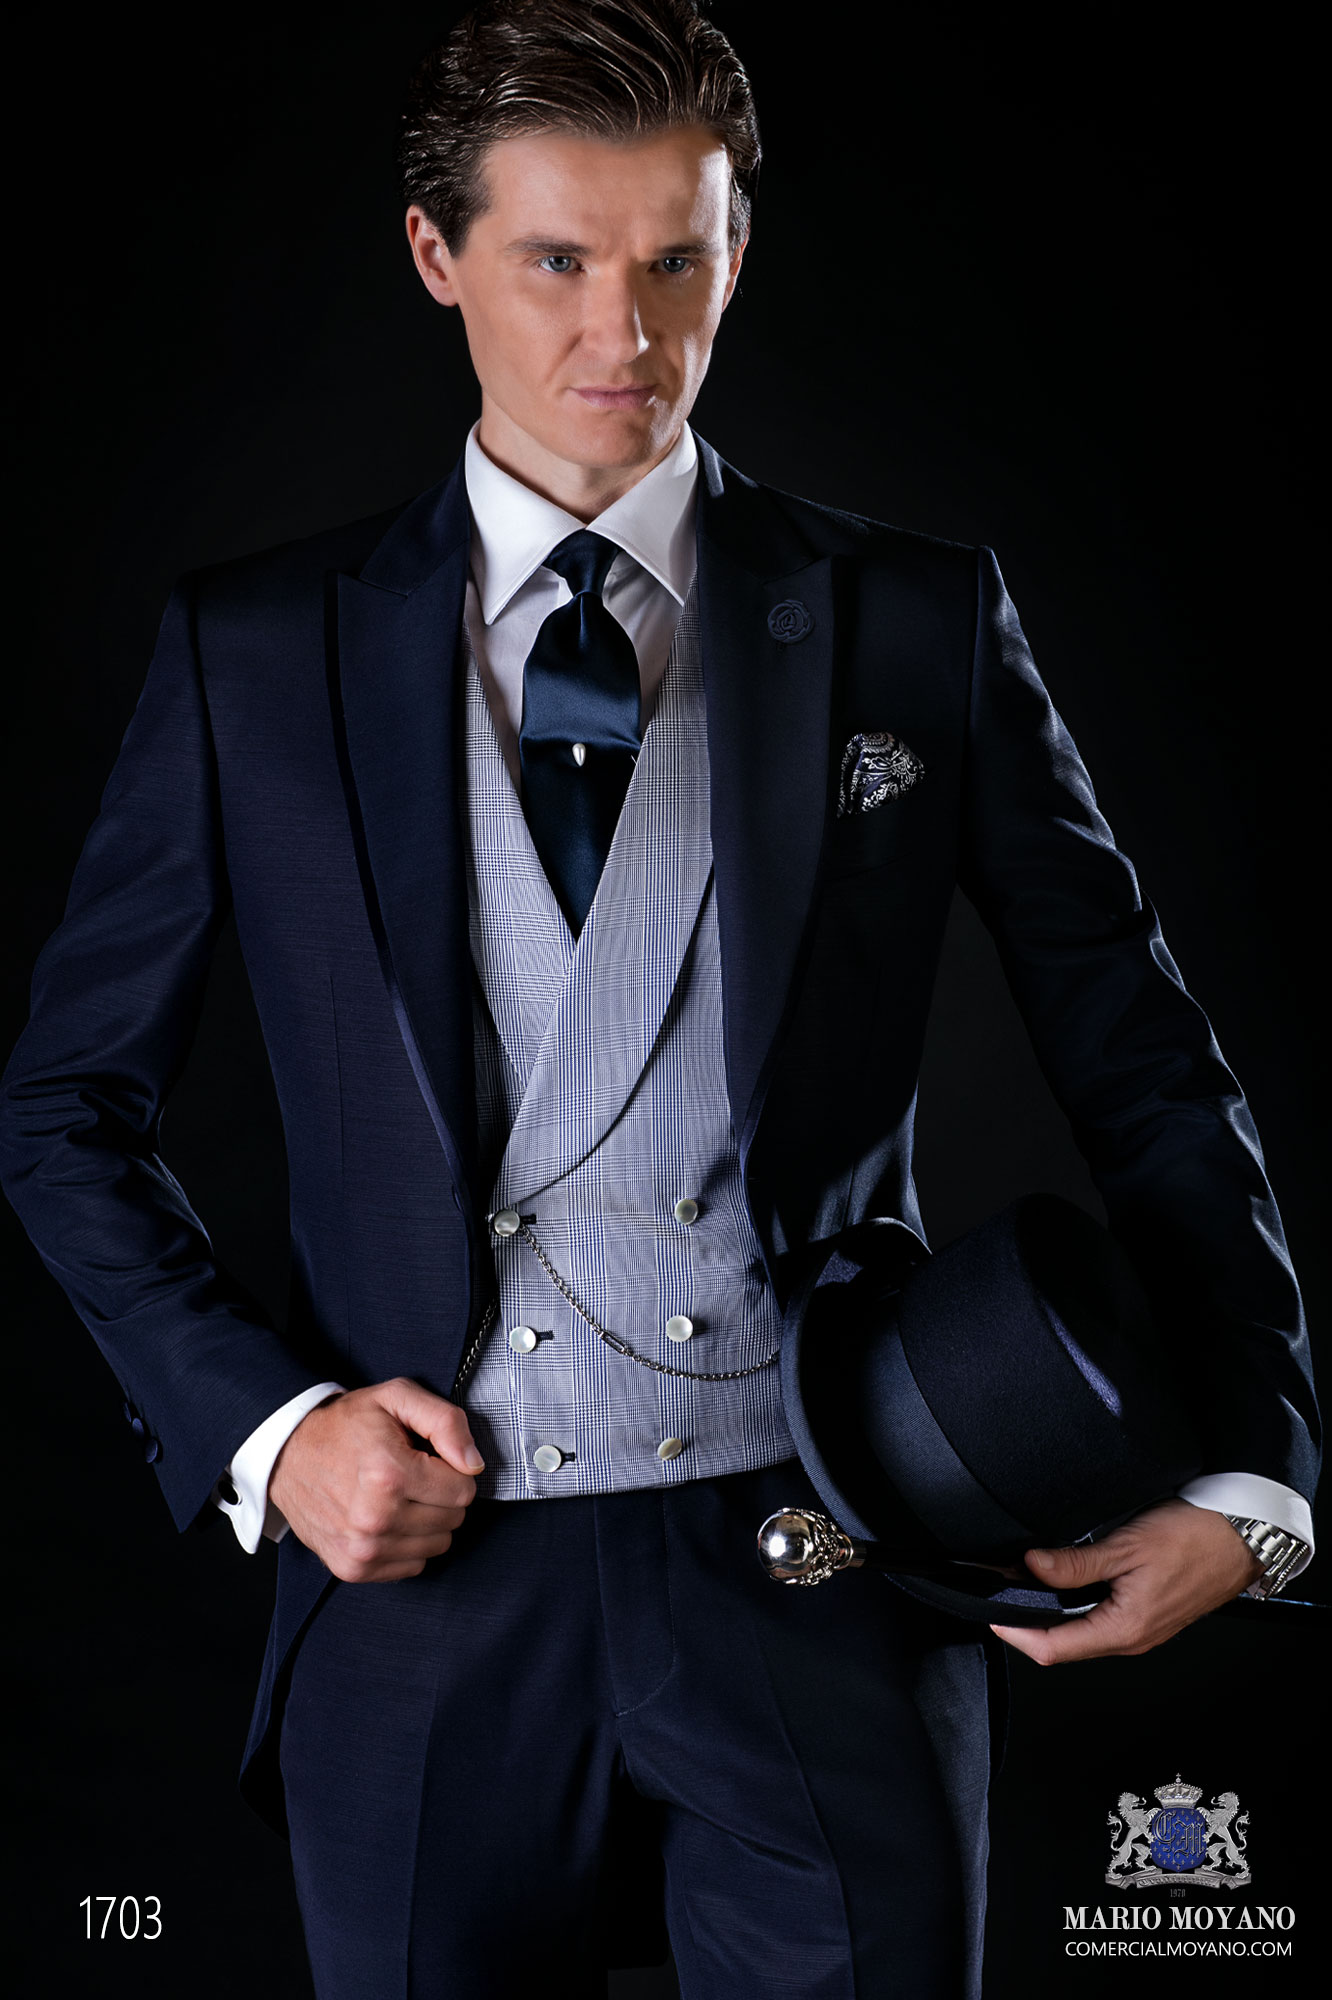 Männer Hochzeit Anzüge Fashion-Kollektion 2018 Ottavio Nuccio Gala ...